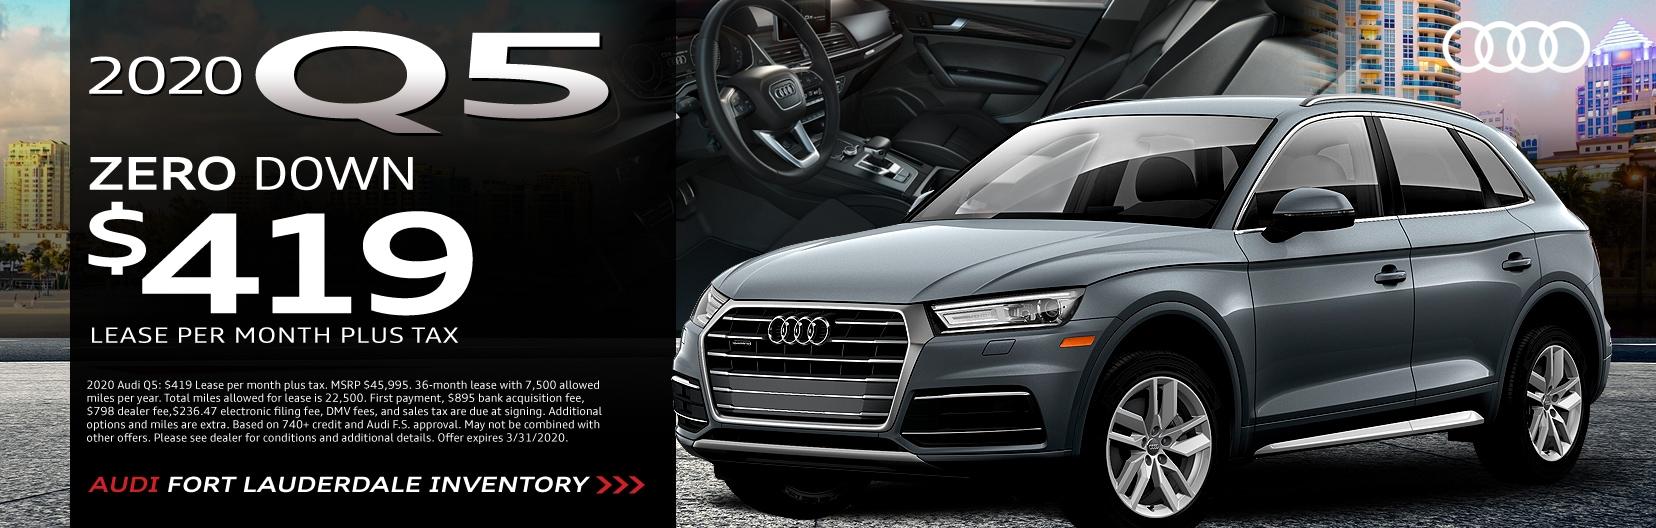 Audi Lighthouse Point >> Audi Fort Lauderdale | New Audi Dealership Serving ...